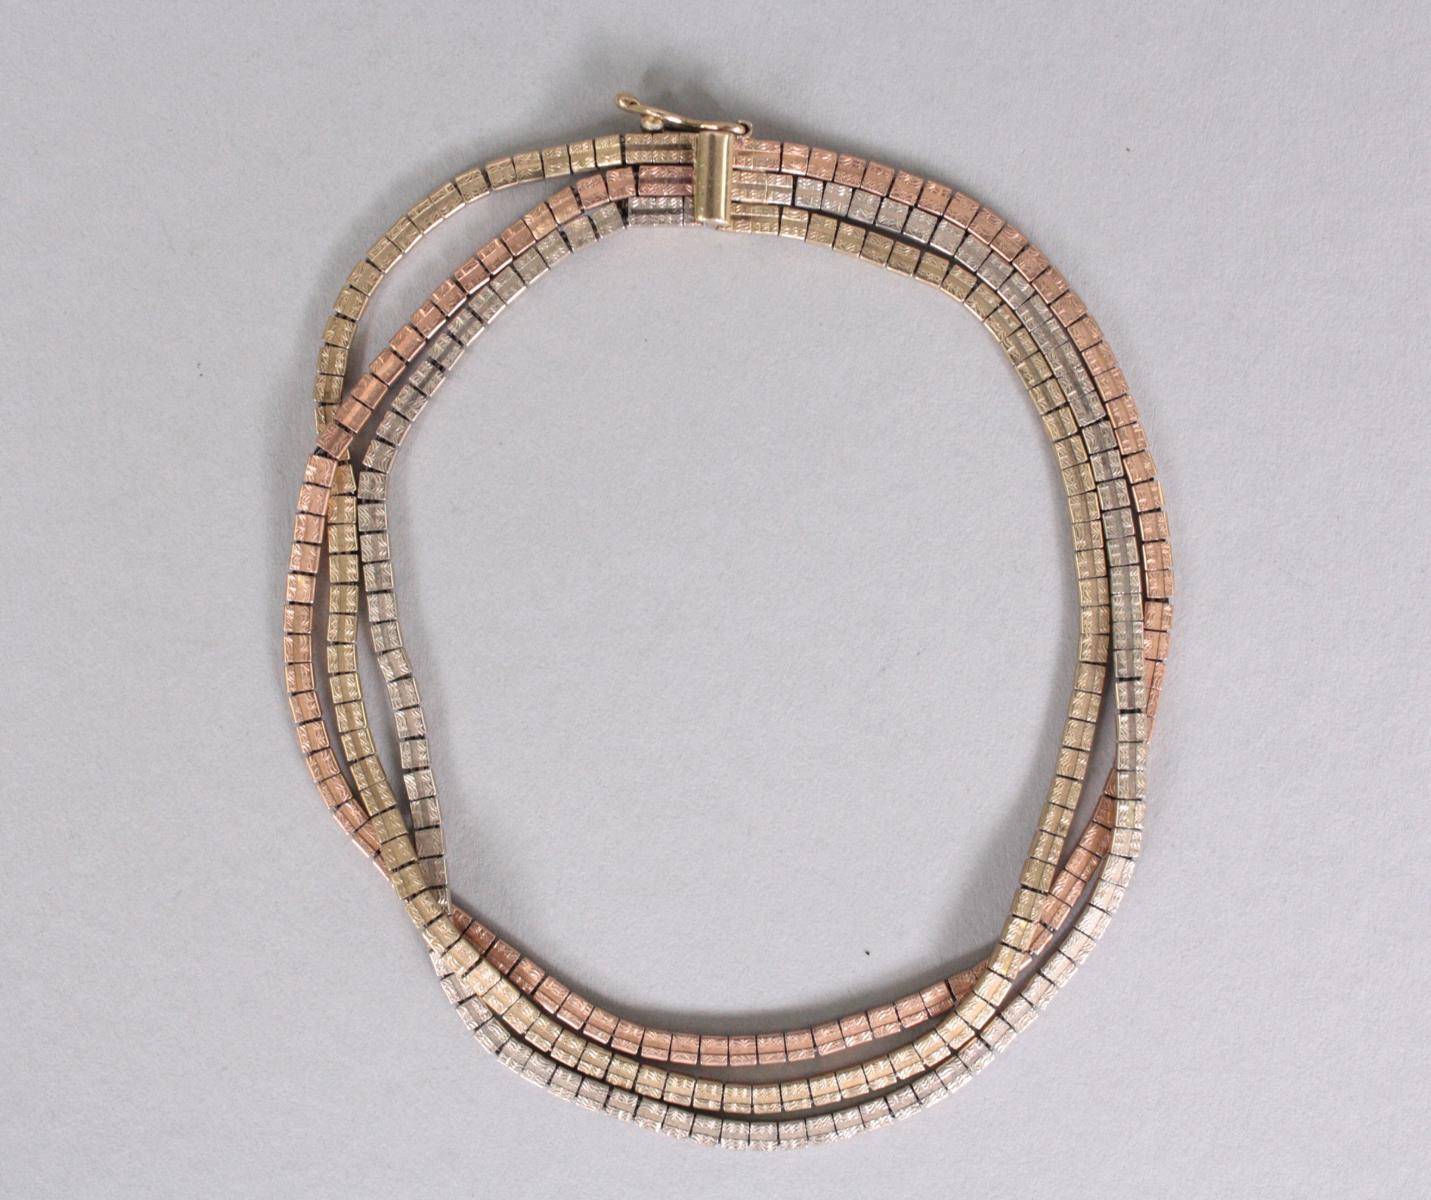 Tricolor-Goldarmband, 8 Karat-2